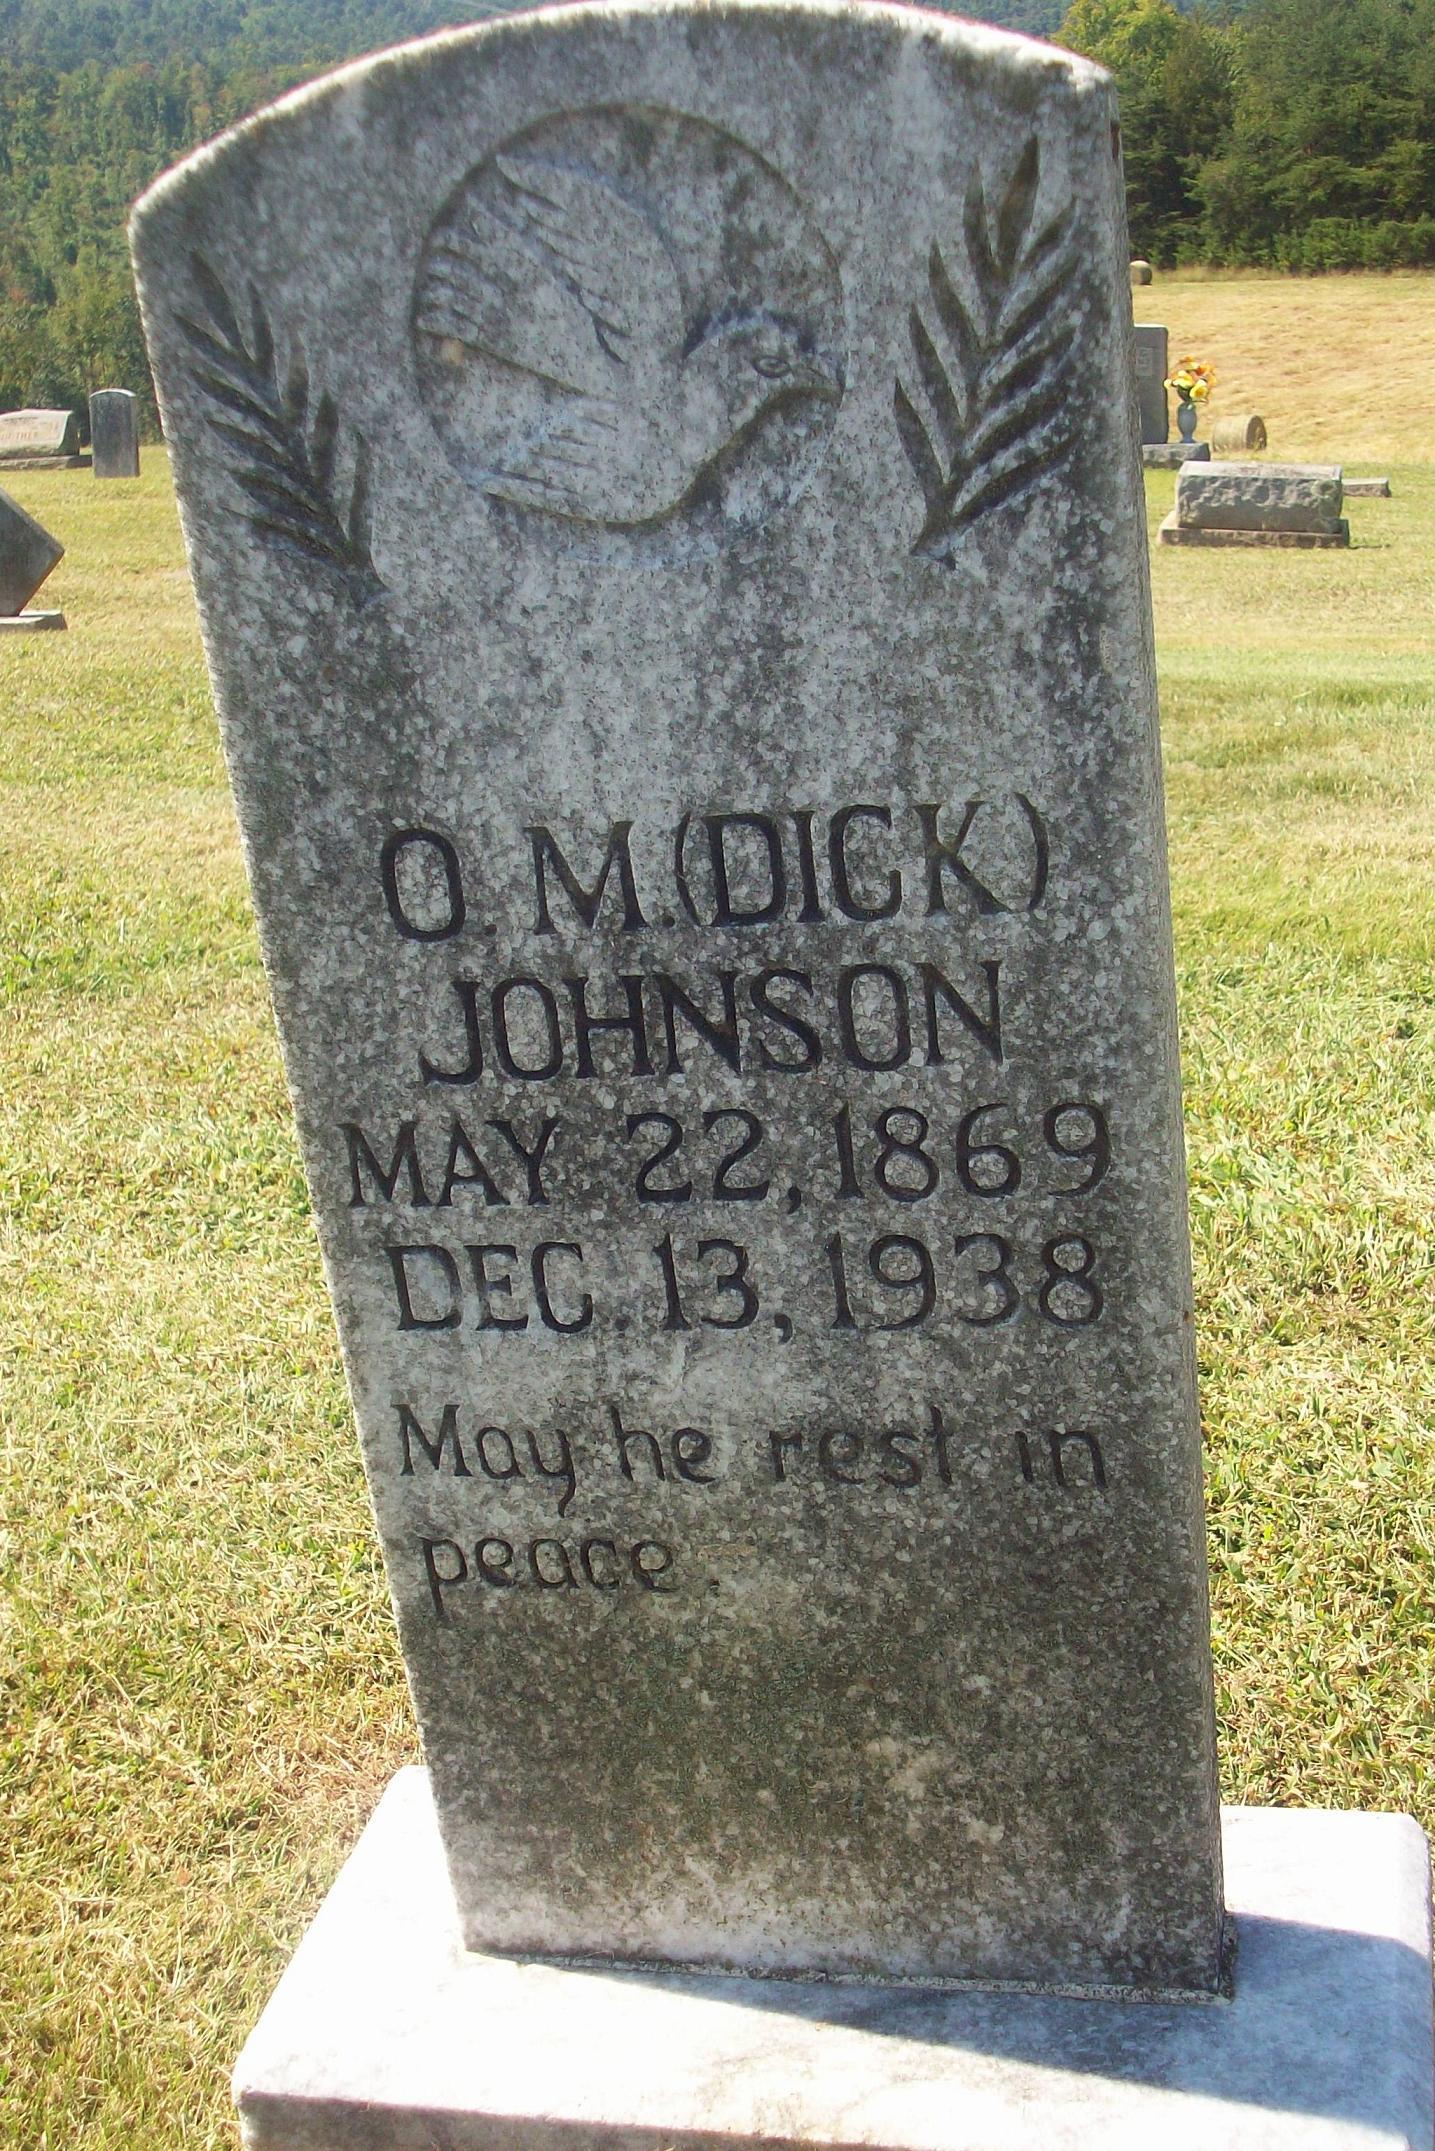 Meletine Johnson